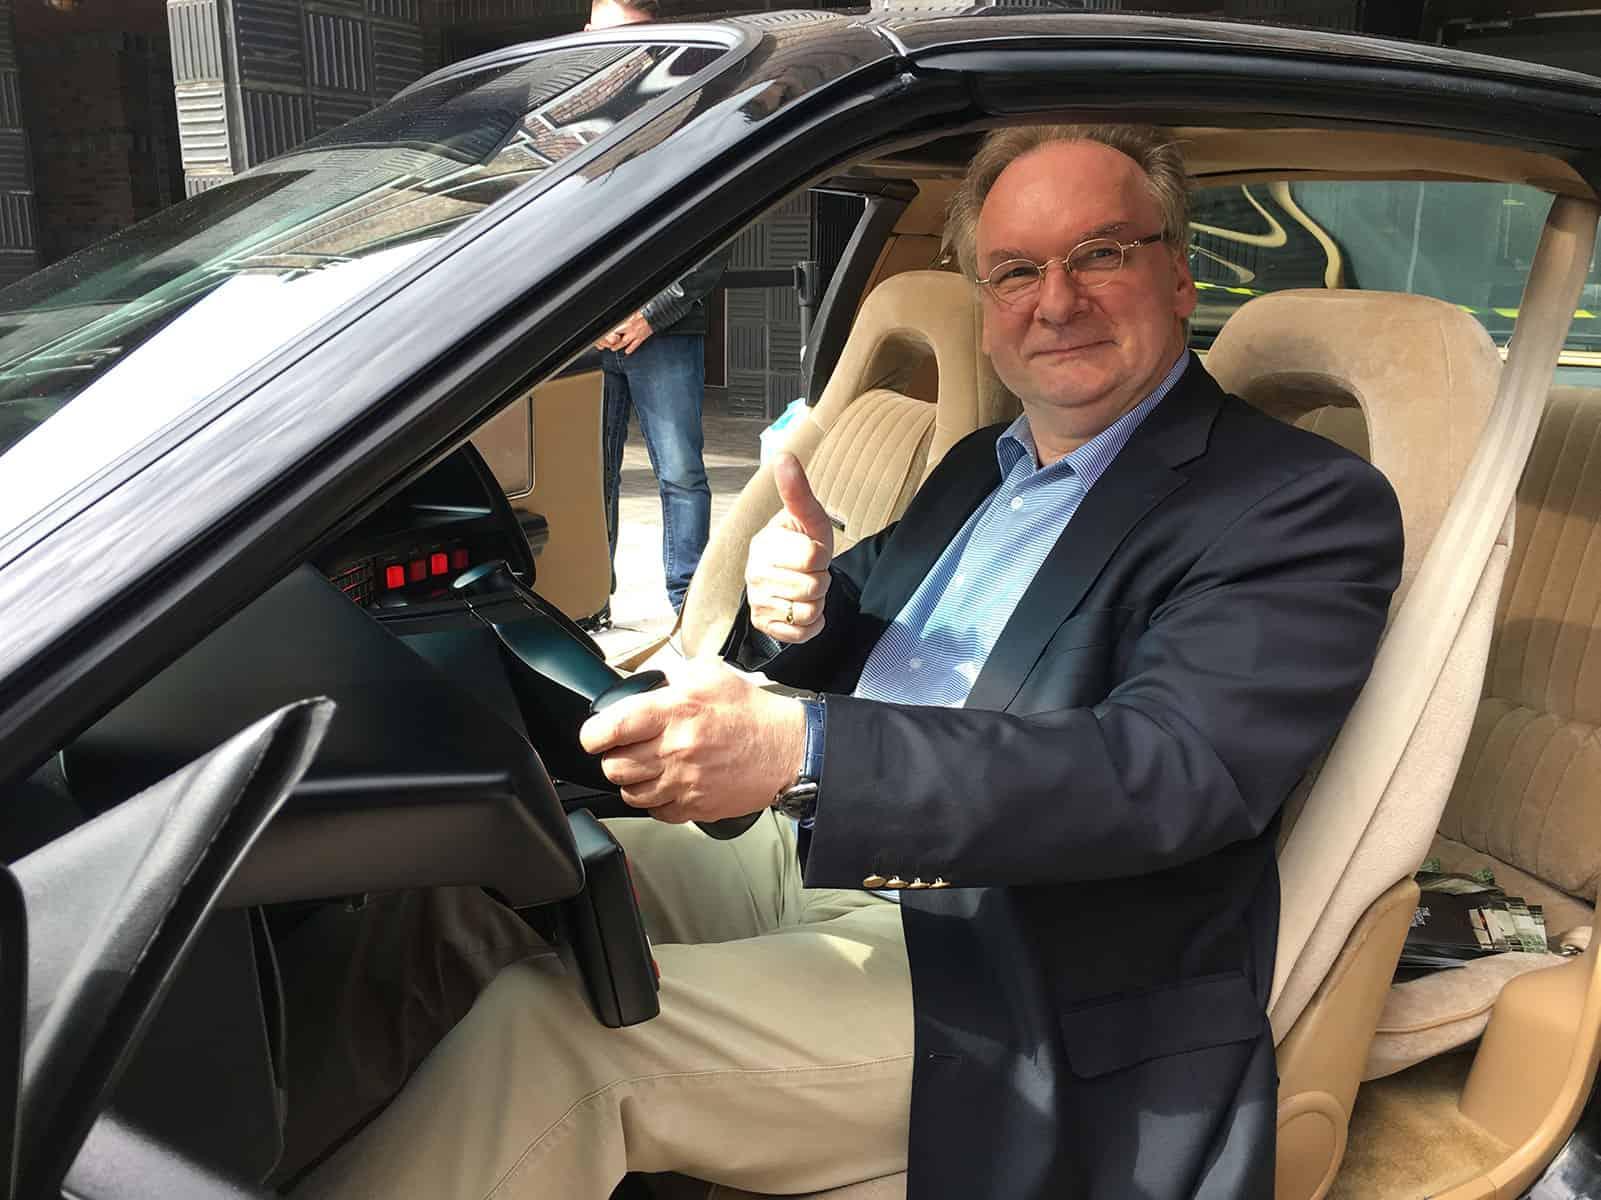 Rainer Haseloff KITT Replika CDU Knight Rider of Germany